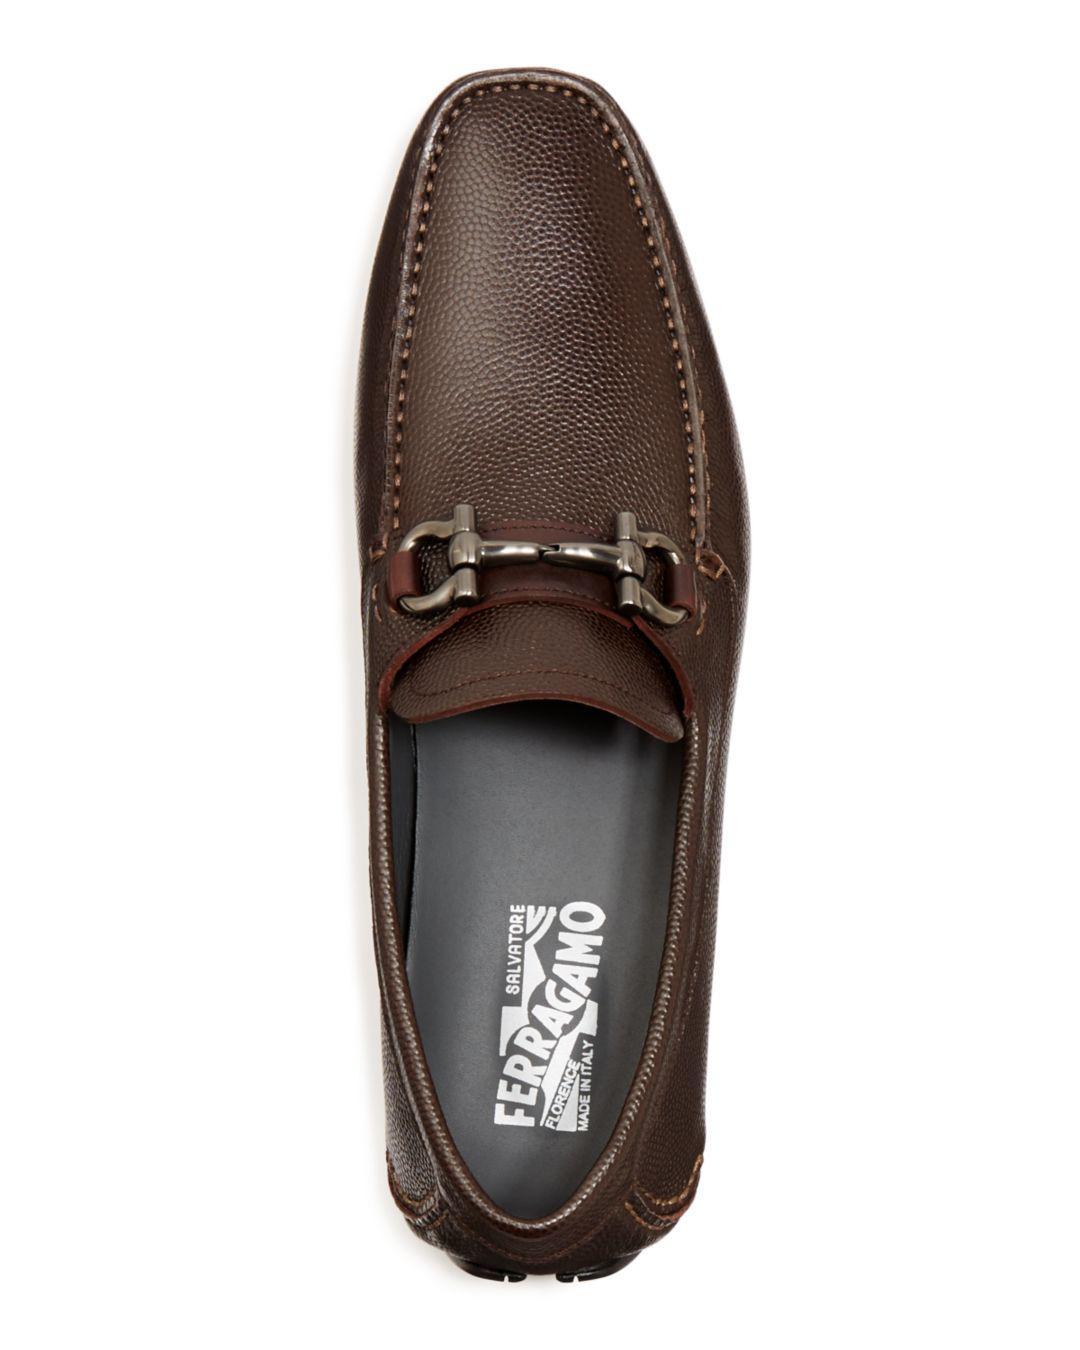 91a15c82fbf Ferragamo - Brown Parigi Pebbled Leather Loafers for Men - Lyst. View  fullscreen